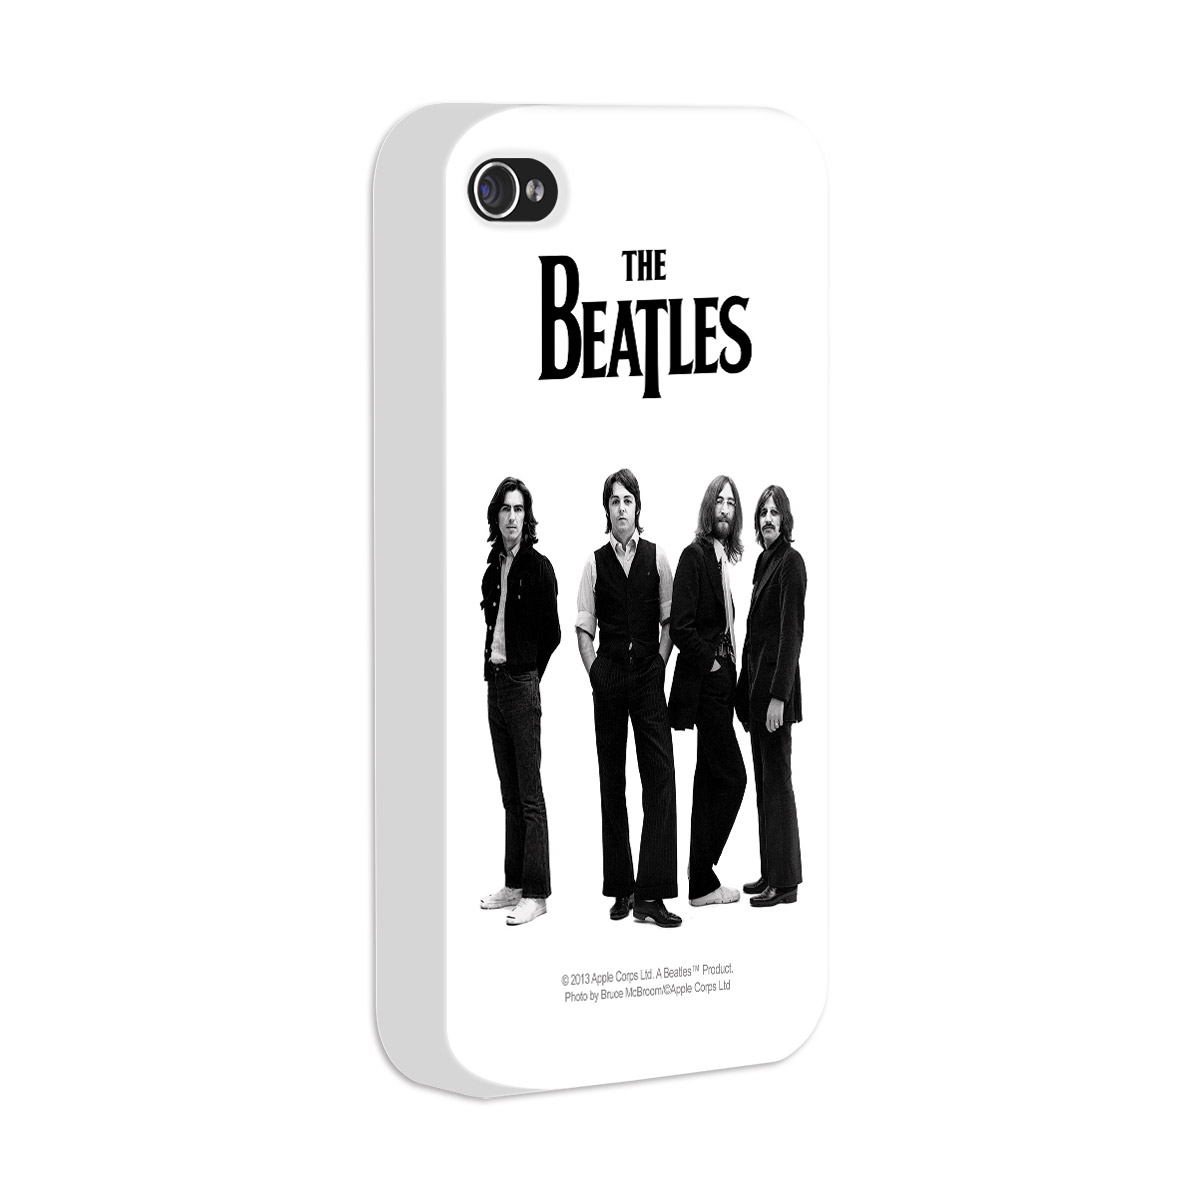 Capa de iPhone 4/4S The Beatles Anos 70